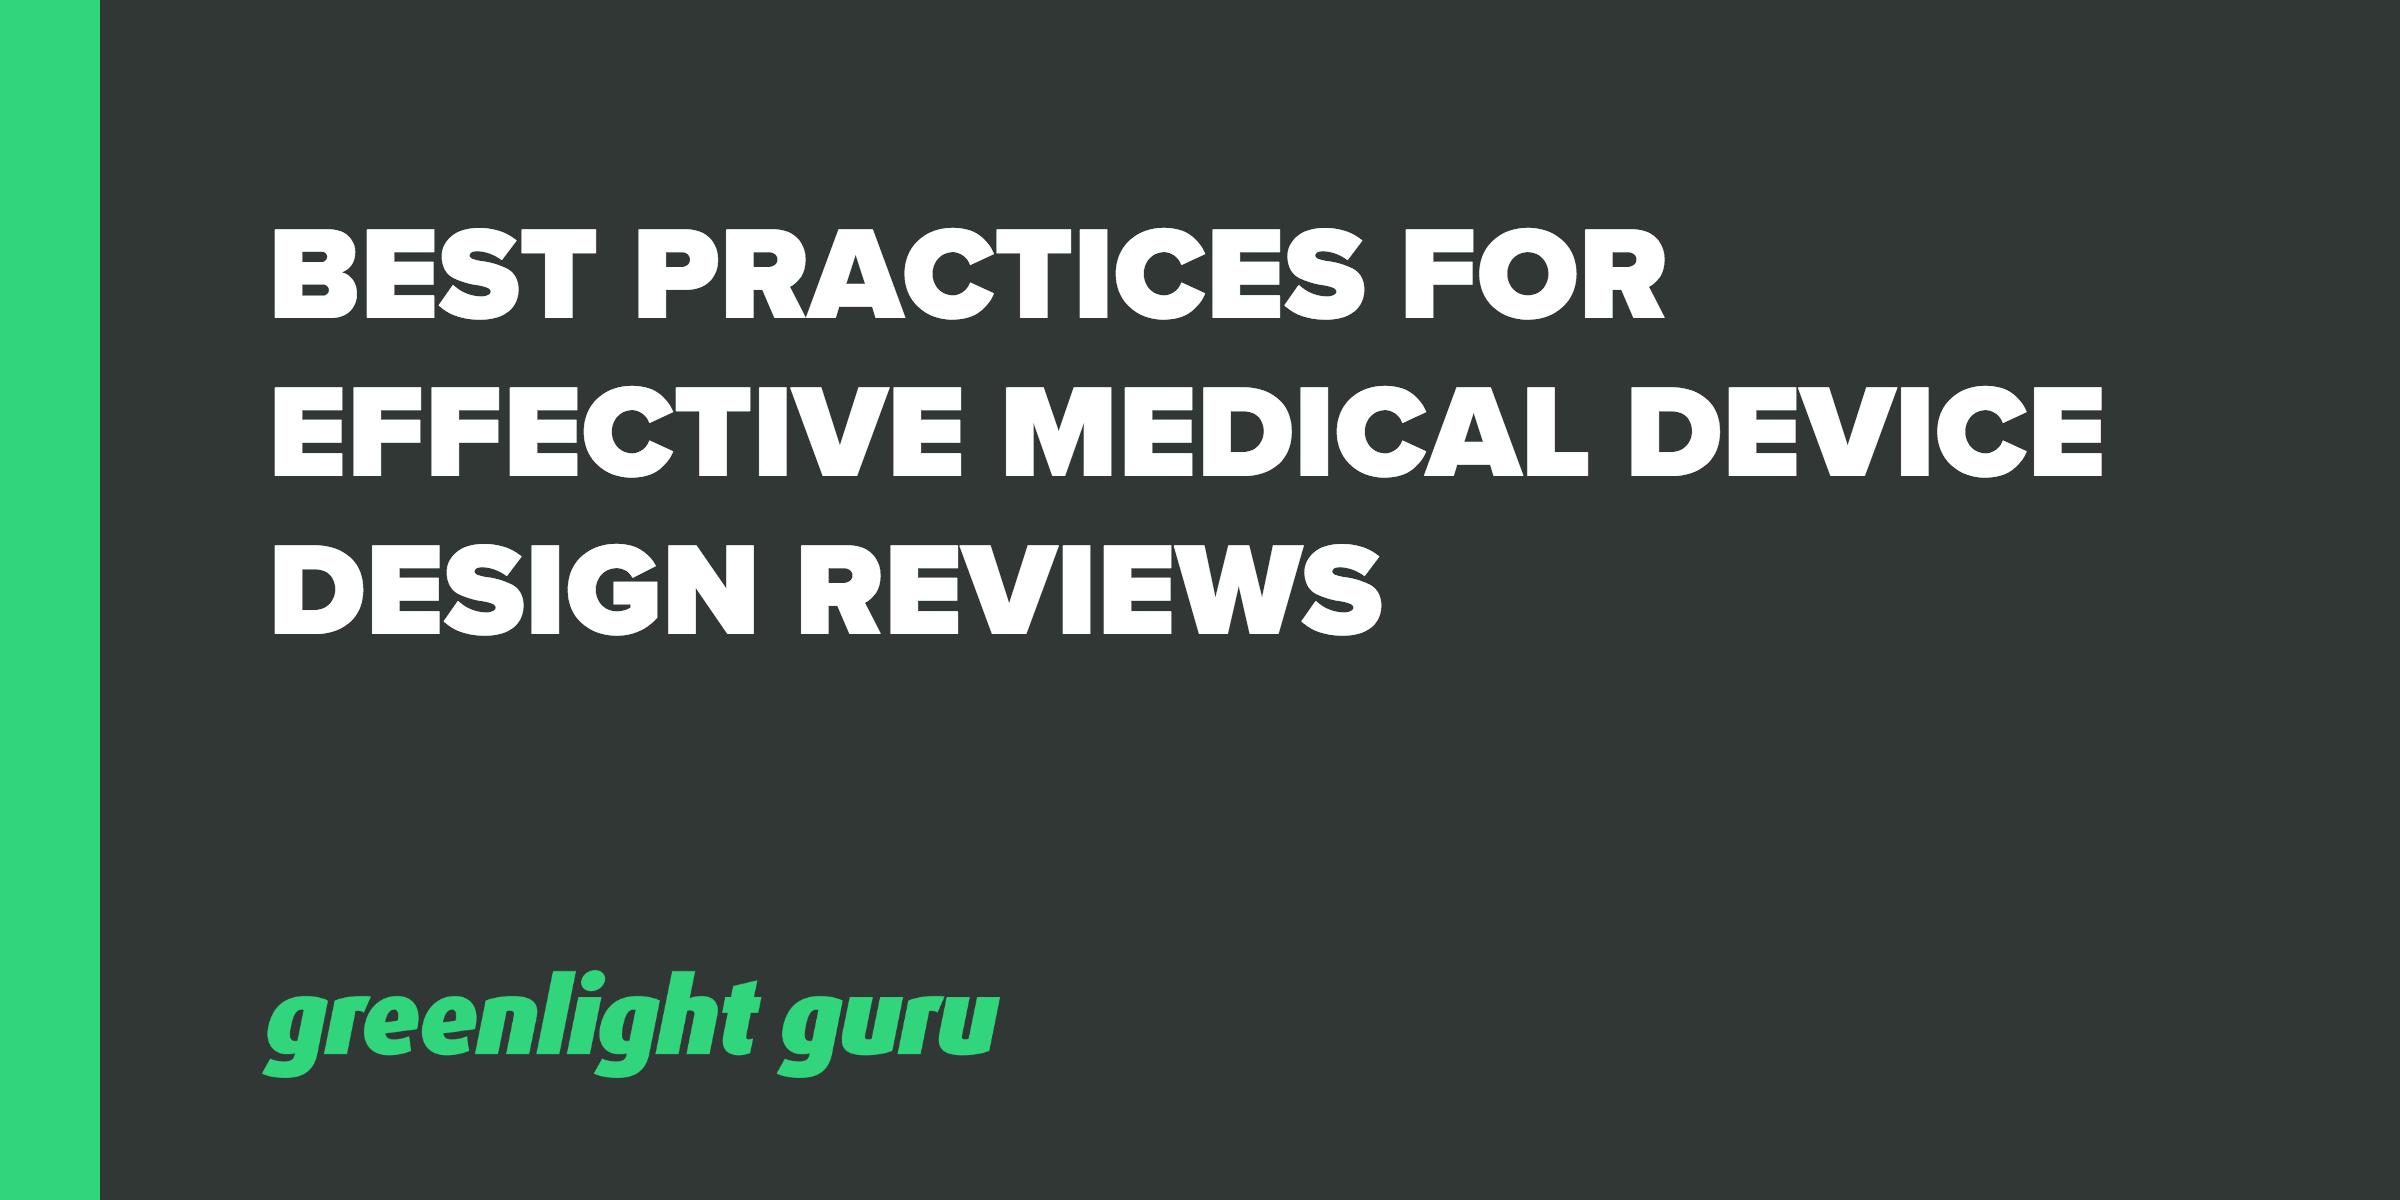 best-practices-design-reviews